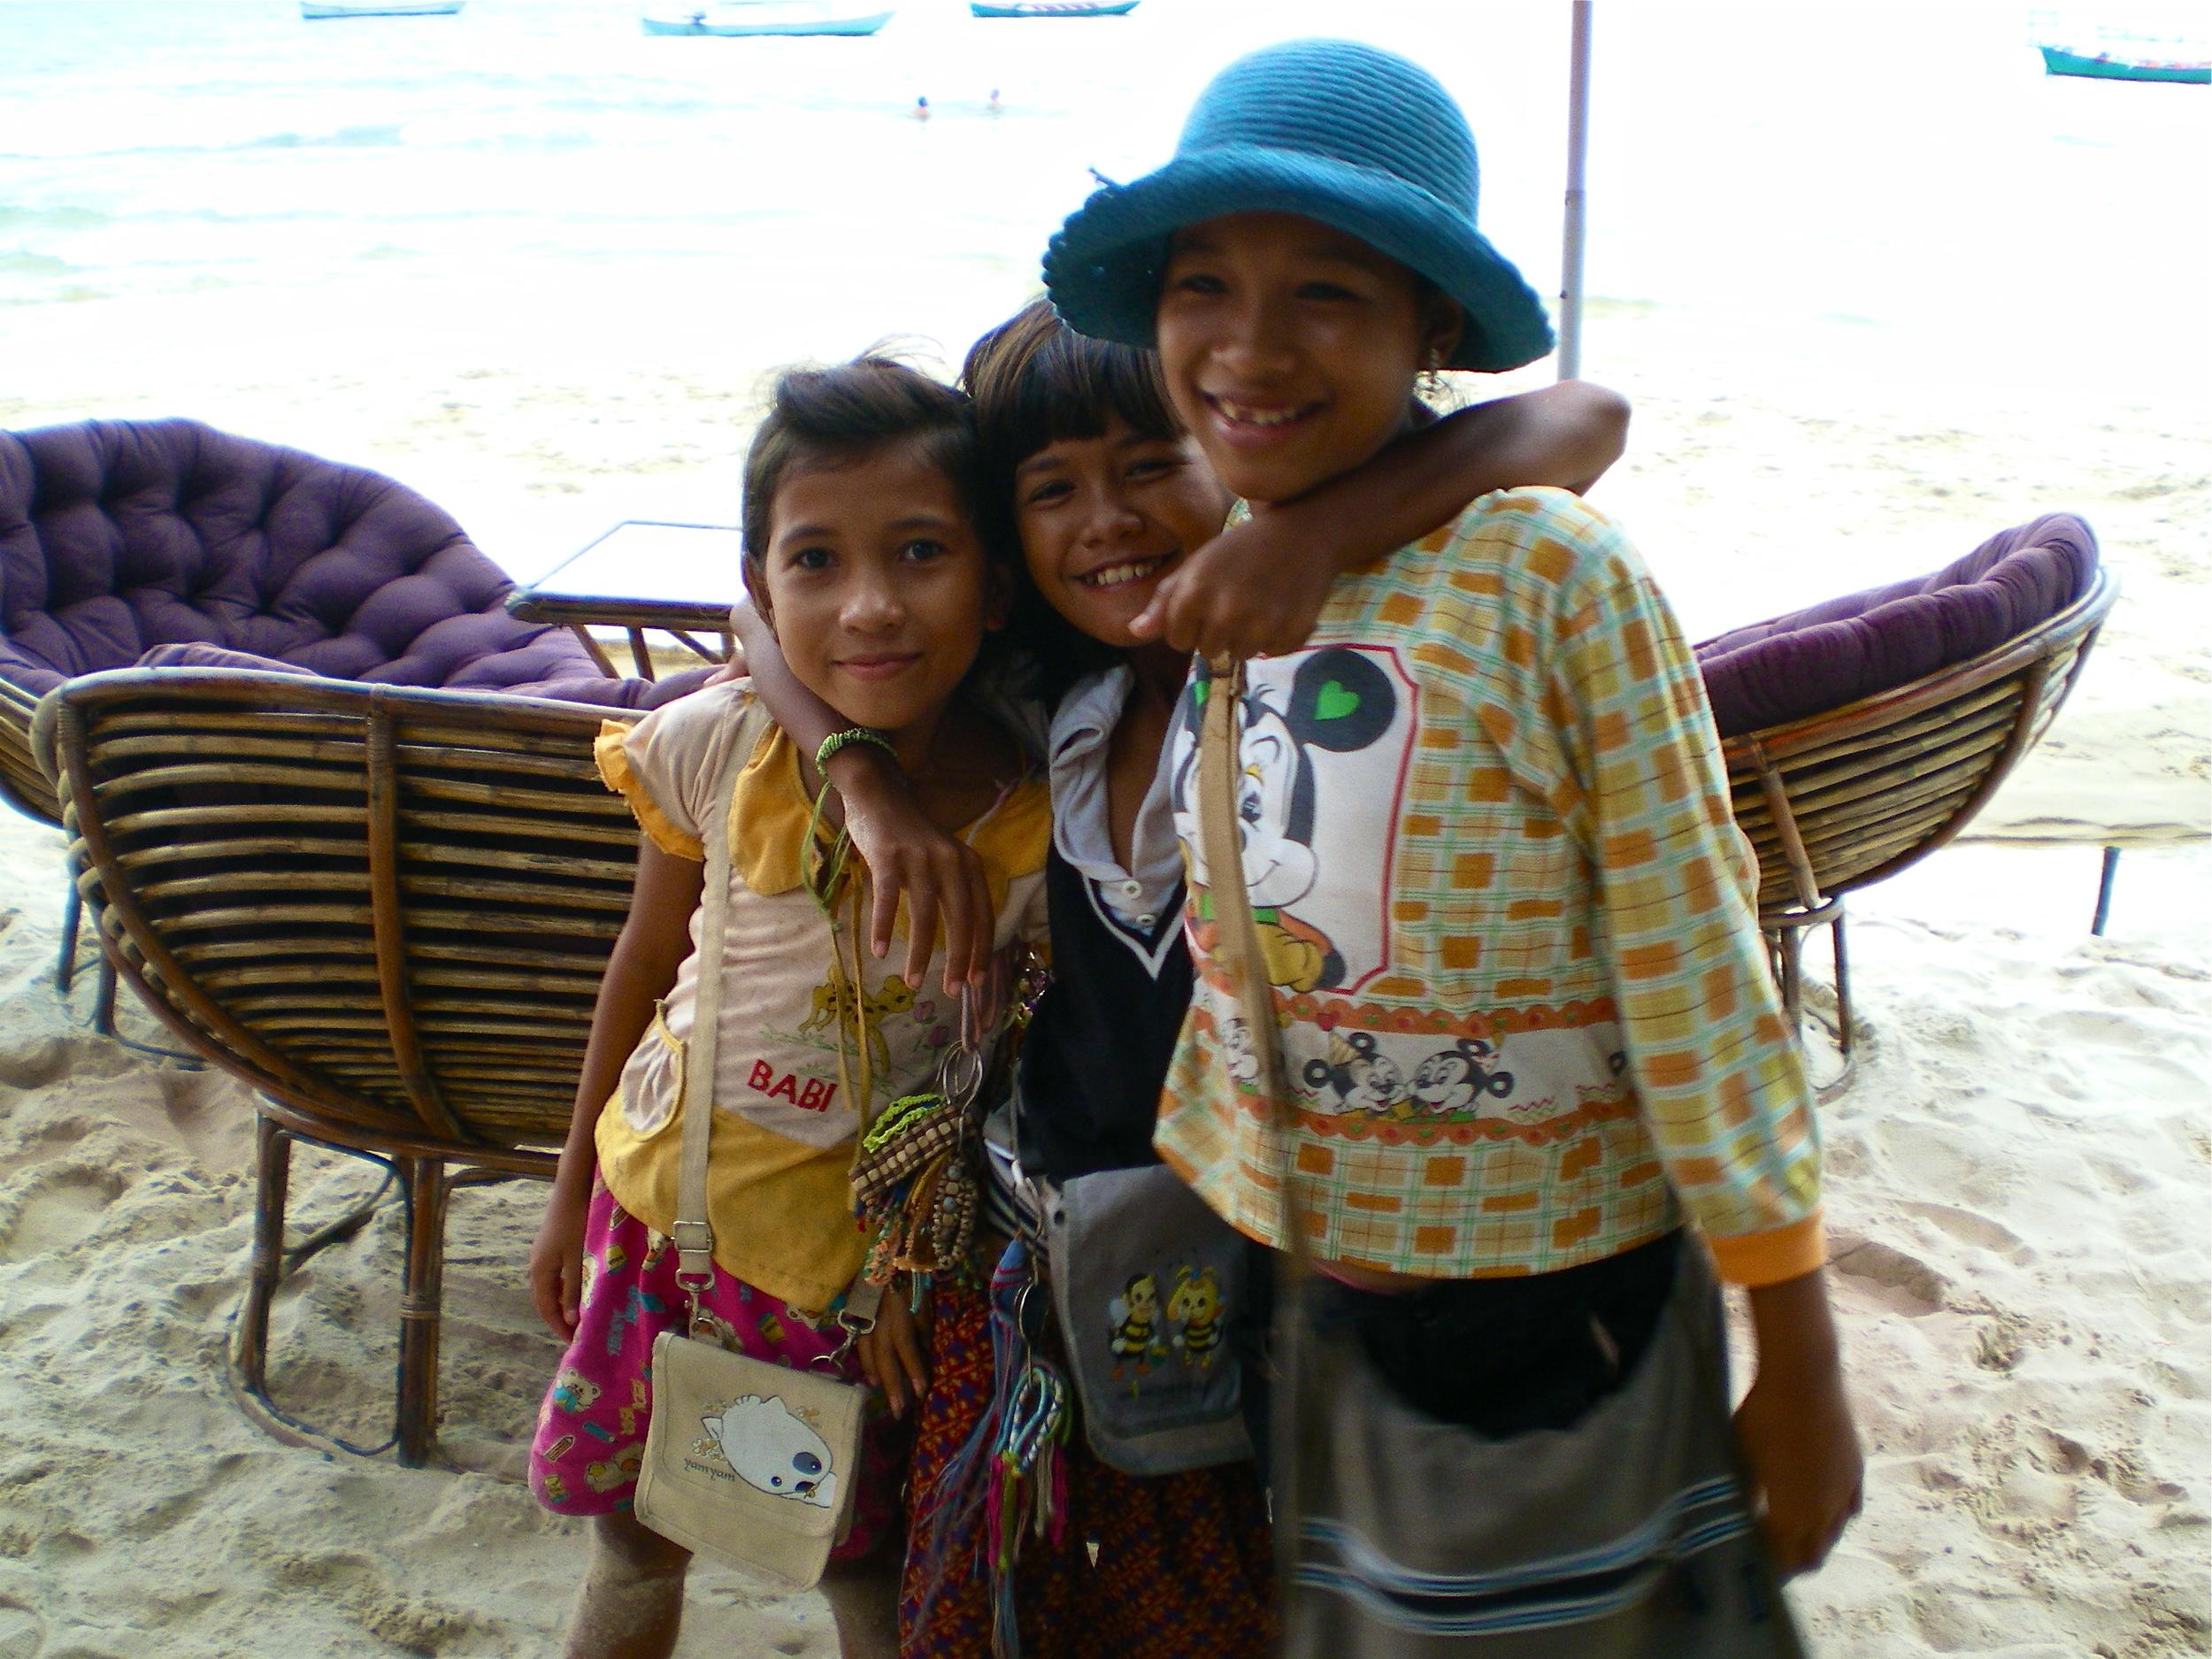 CambodiaChildren.jpg